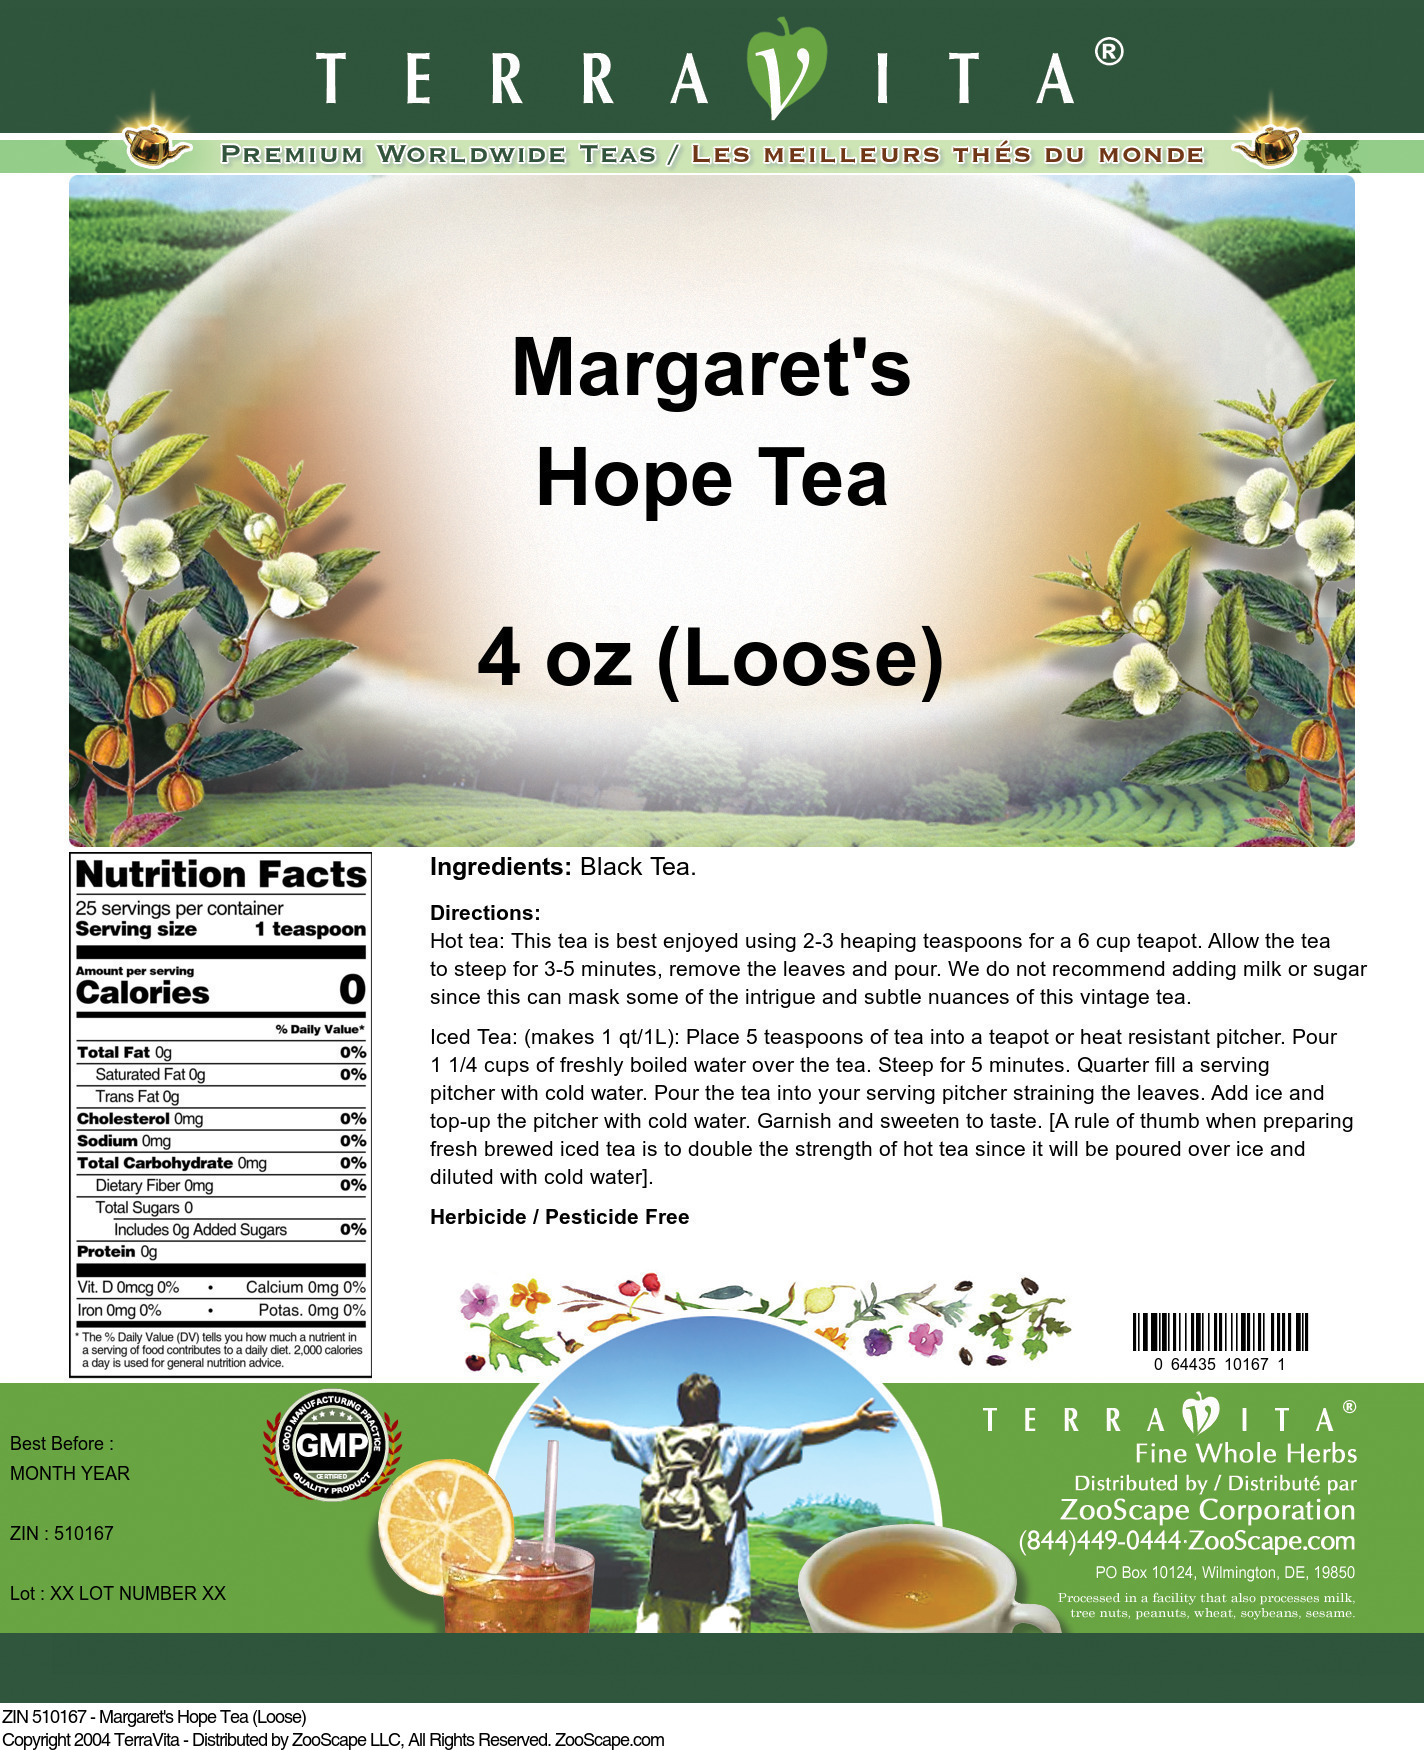 Margaret's Hope Tea (Loose)